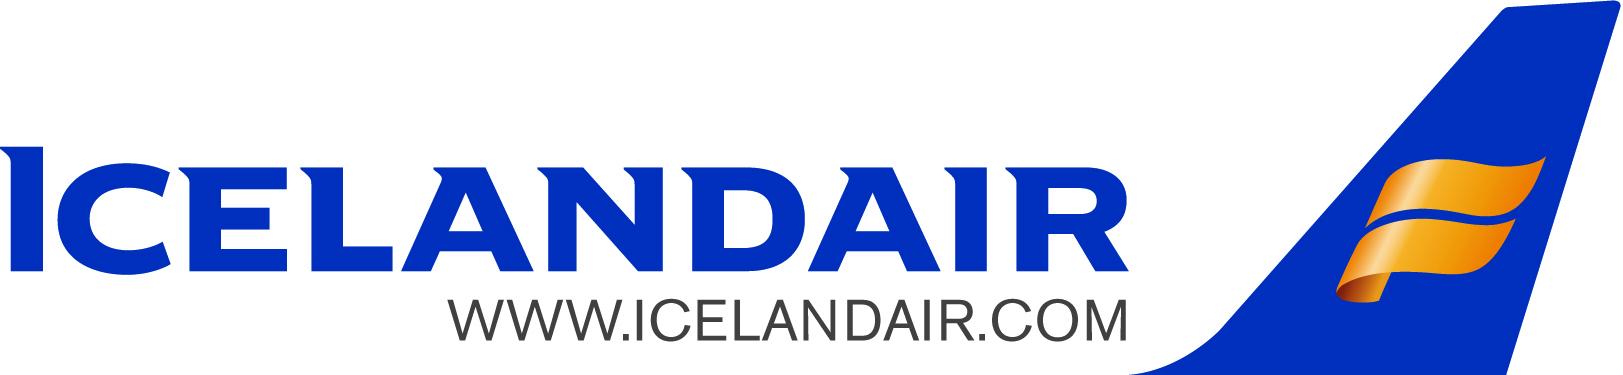 Icelandair логотип